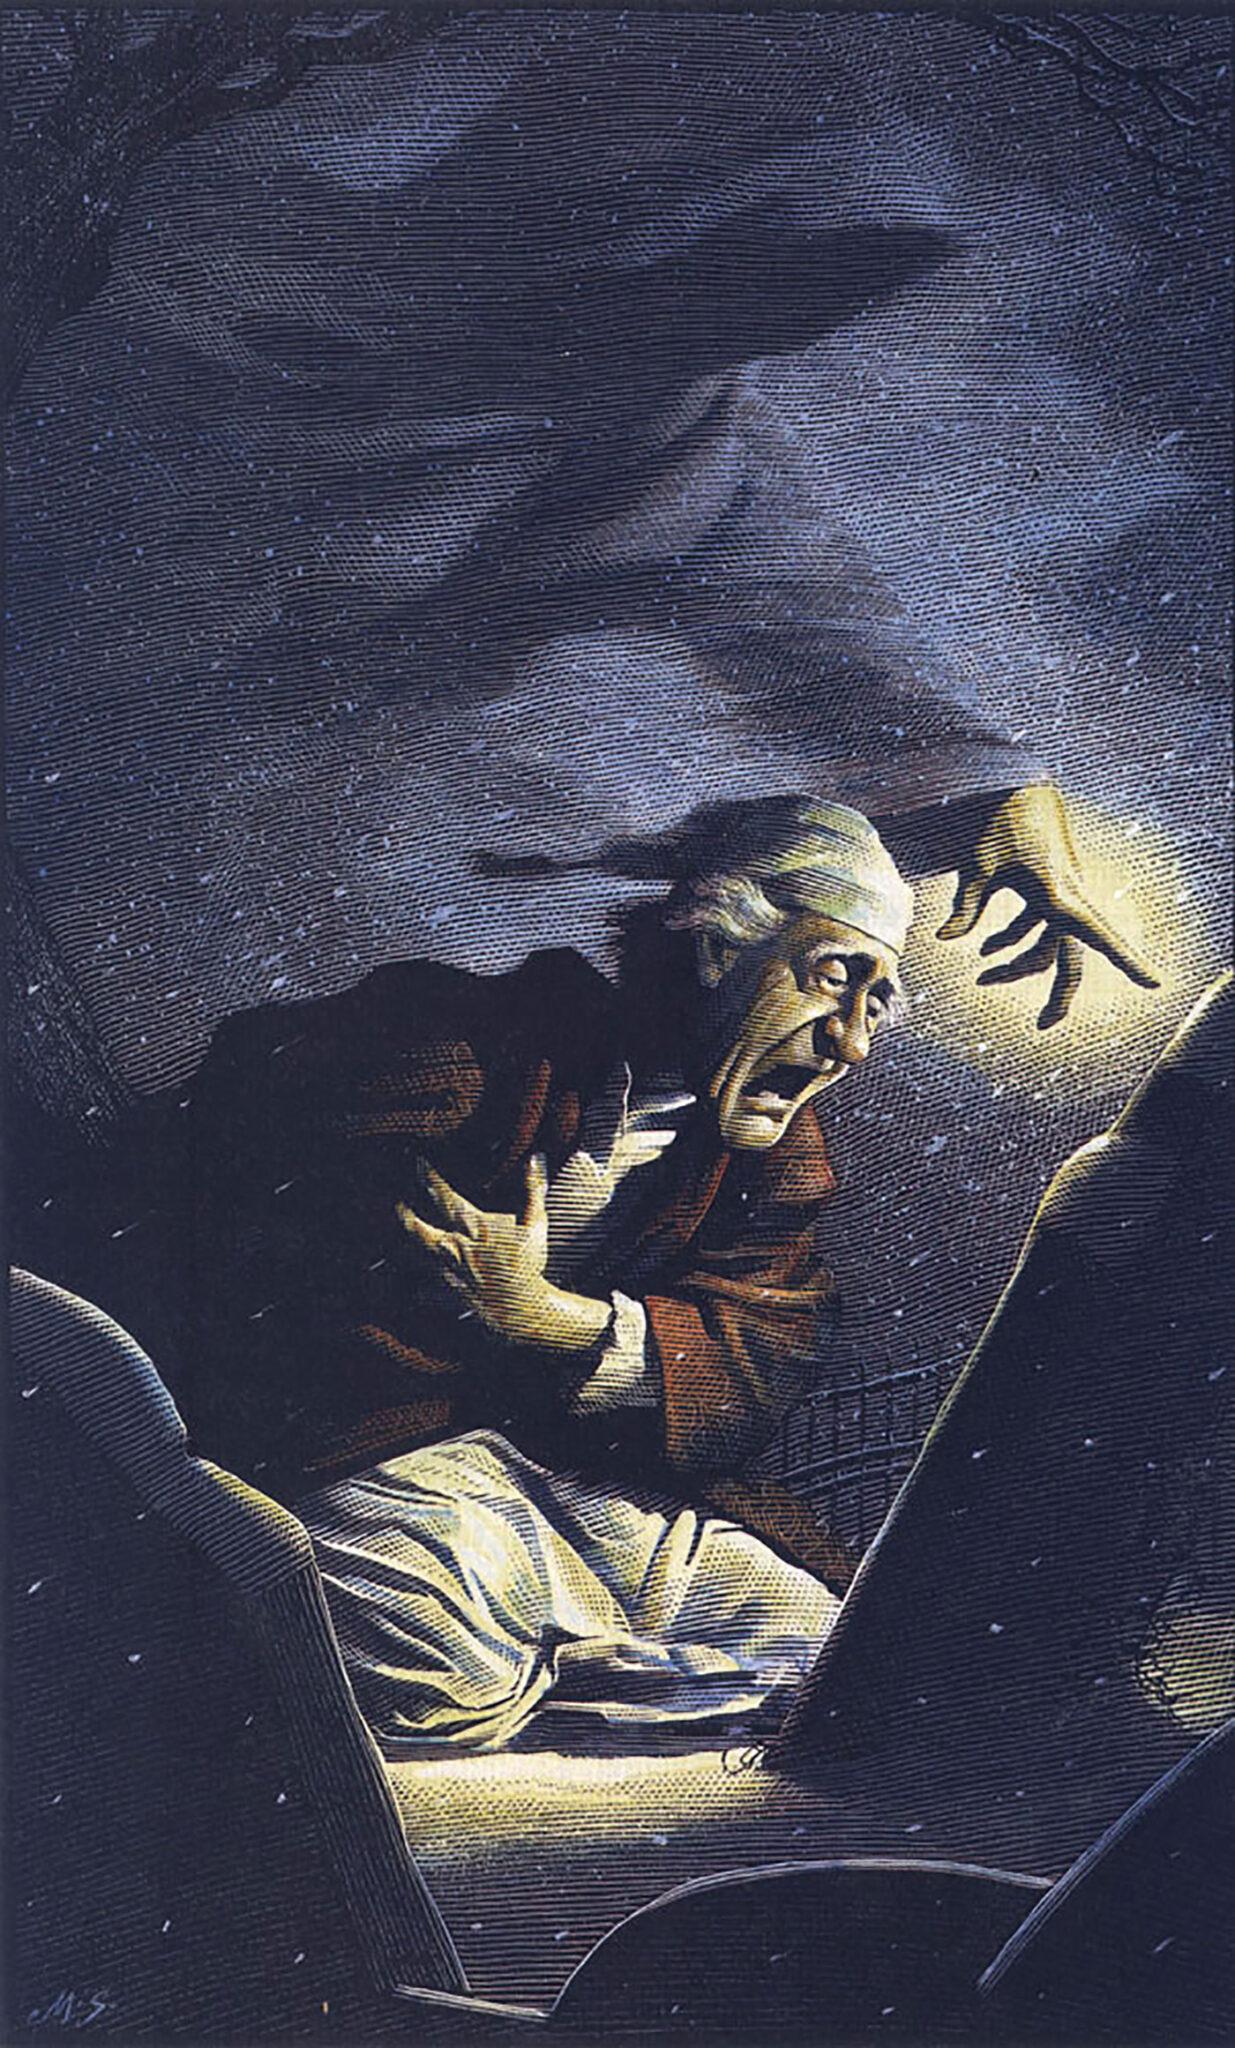 Richard Solomon - Mark-Summers-057-Dickens-07-Scrooge-001